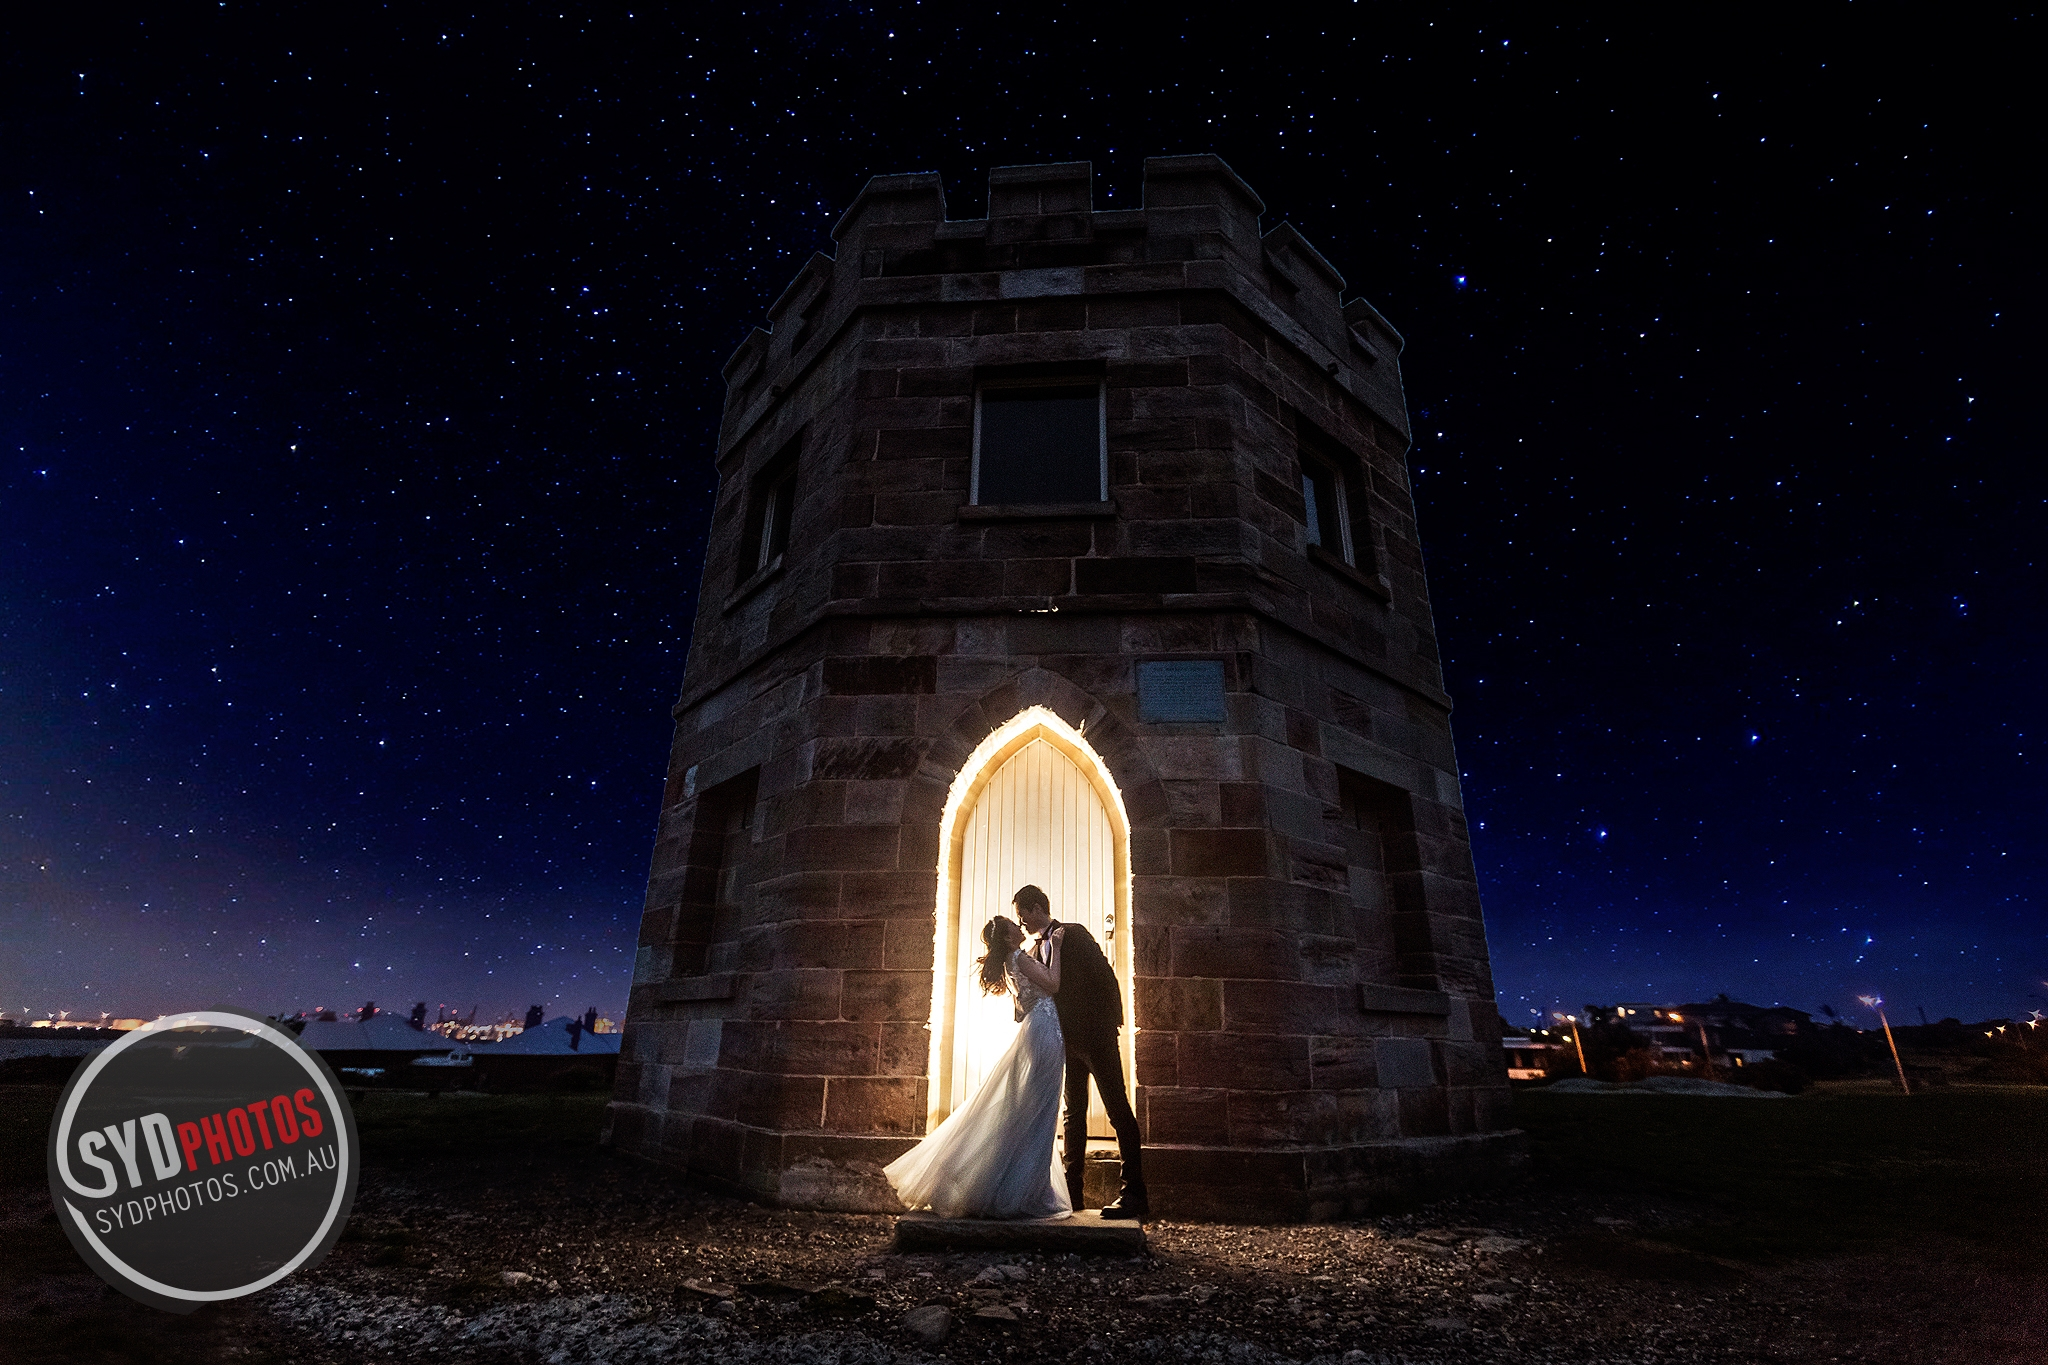 ID-111634-winnie-Prewedding-悉尼婚纱摄影